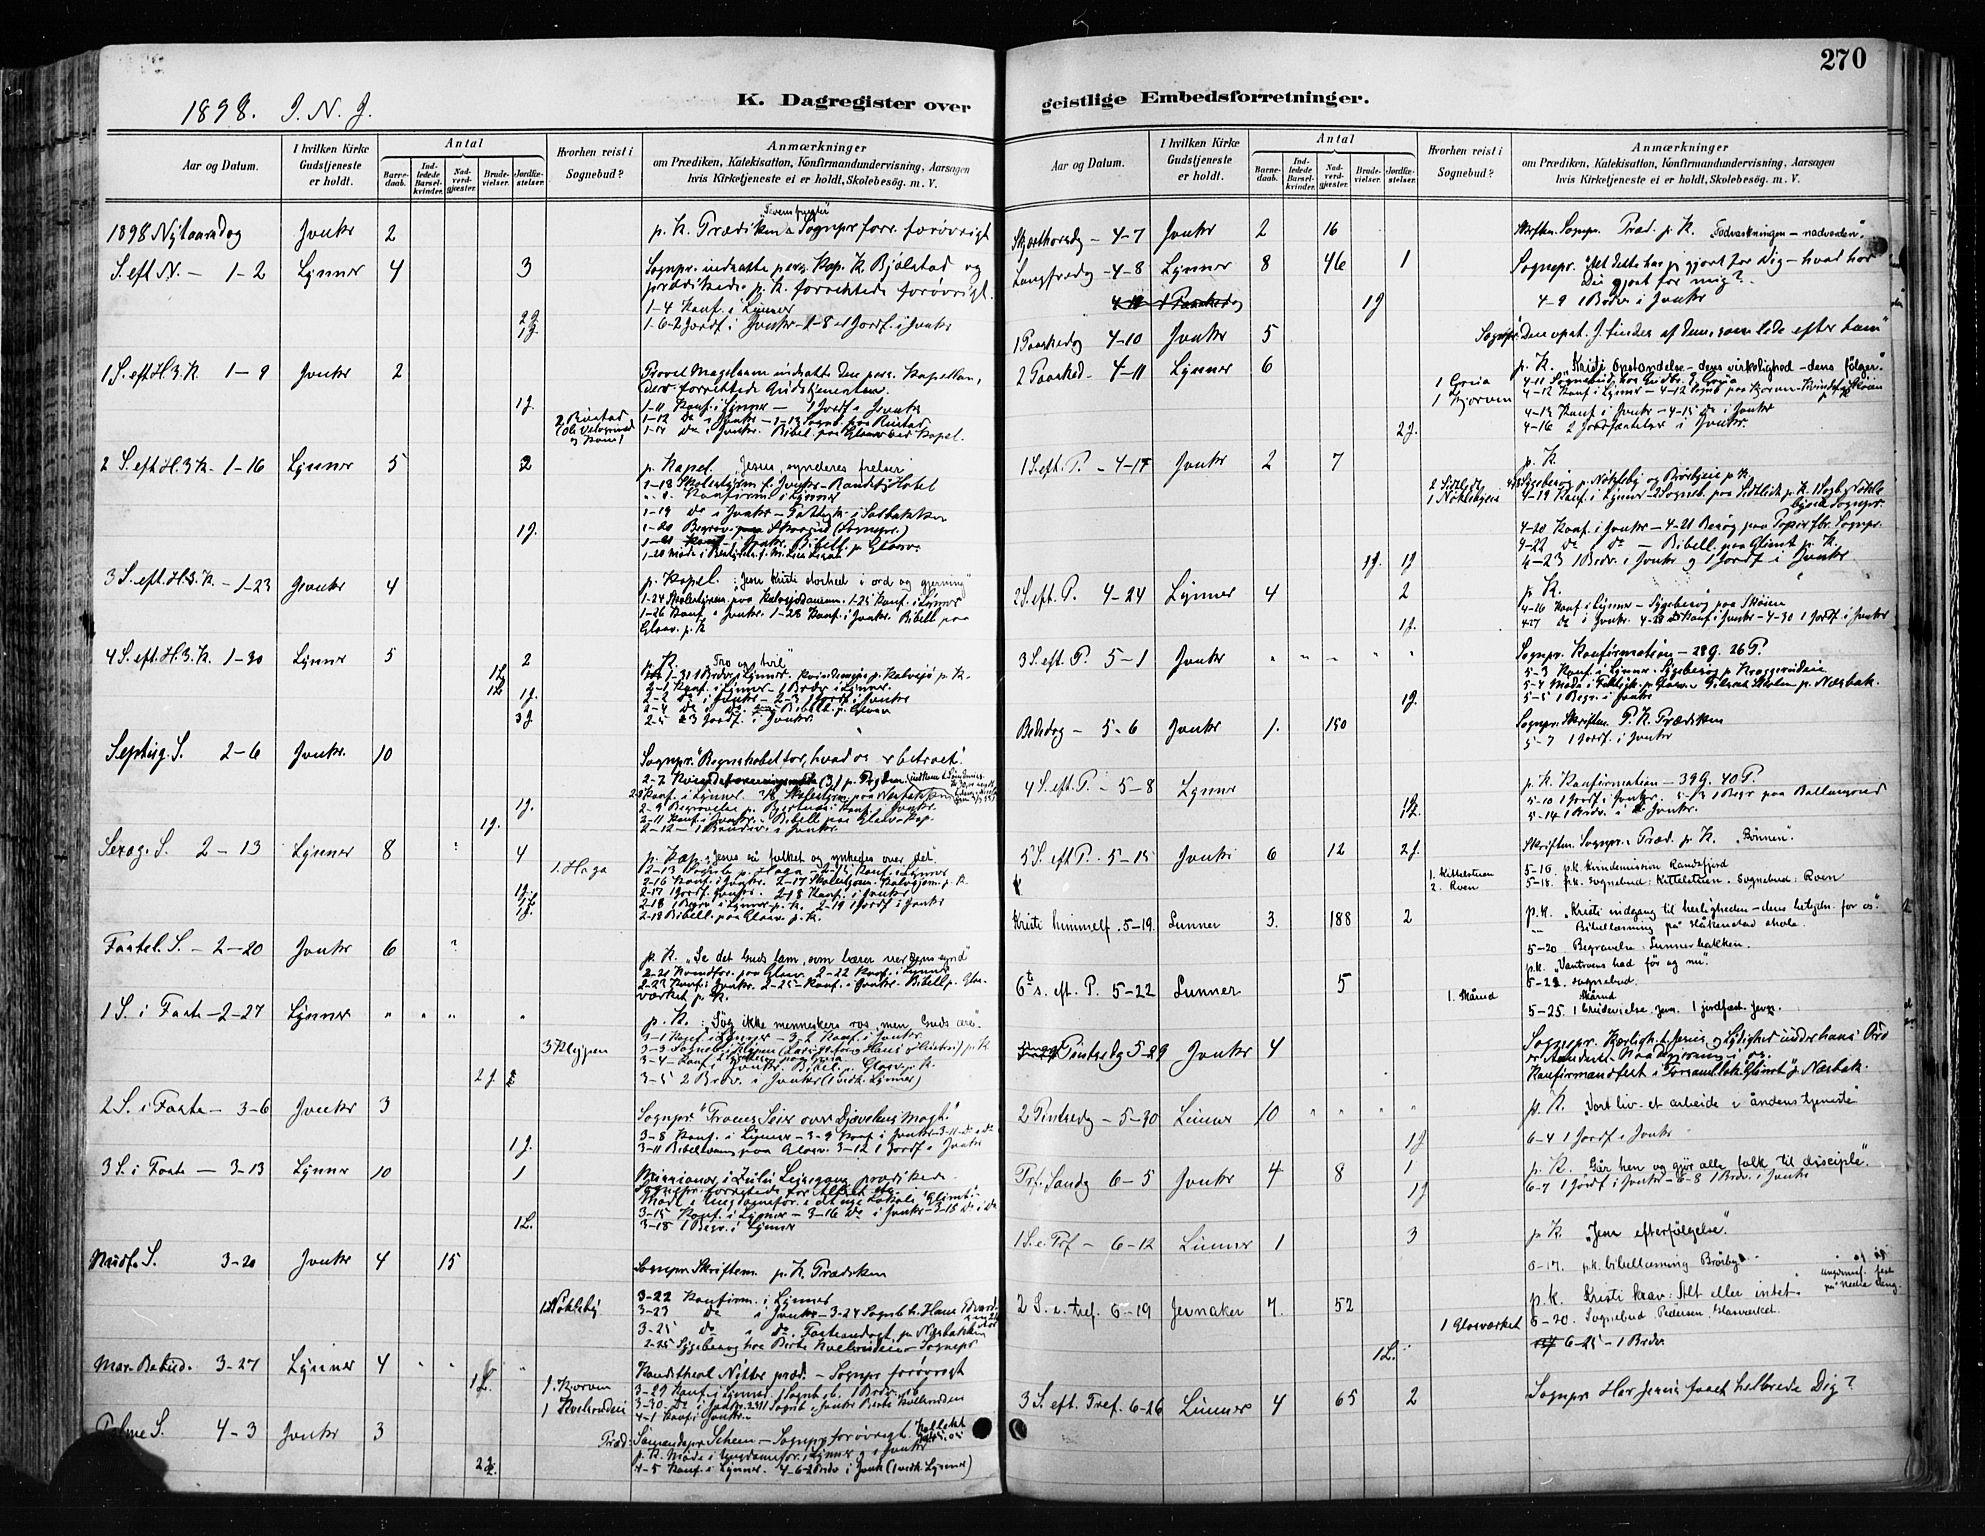 SAH, Jevnaker prestekontor, Ministerialbok nr. 9, 1891-1901, s. 270